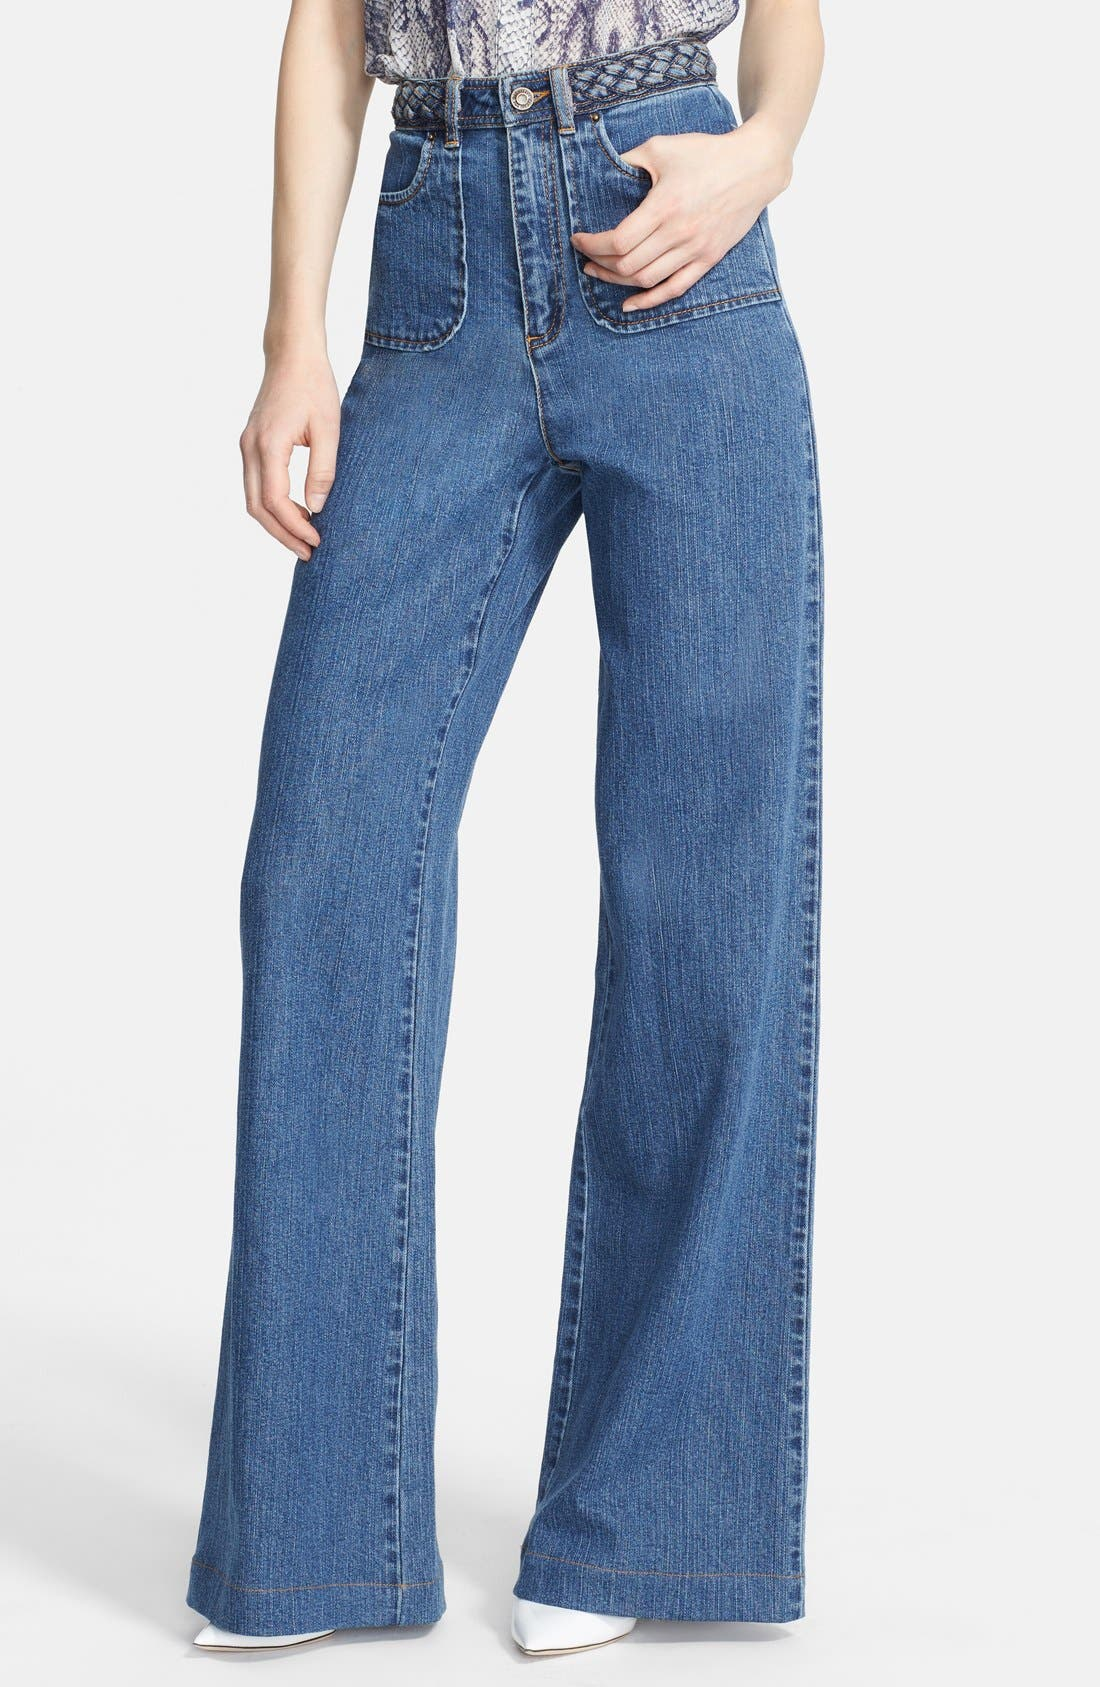 Alternate Image 1 Selected - Rachel Zoe 'Ella' Braided Waist Wide Leg Jeans